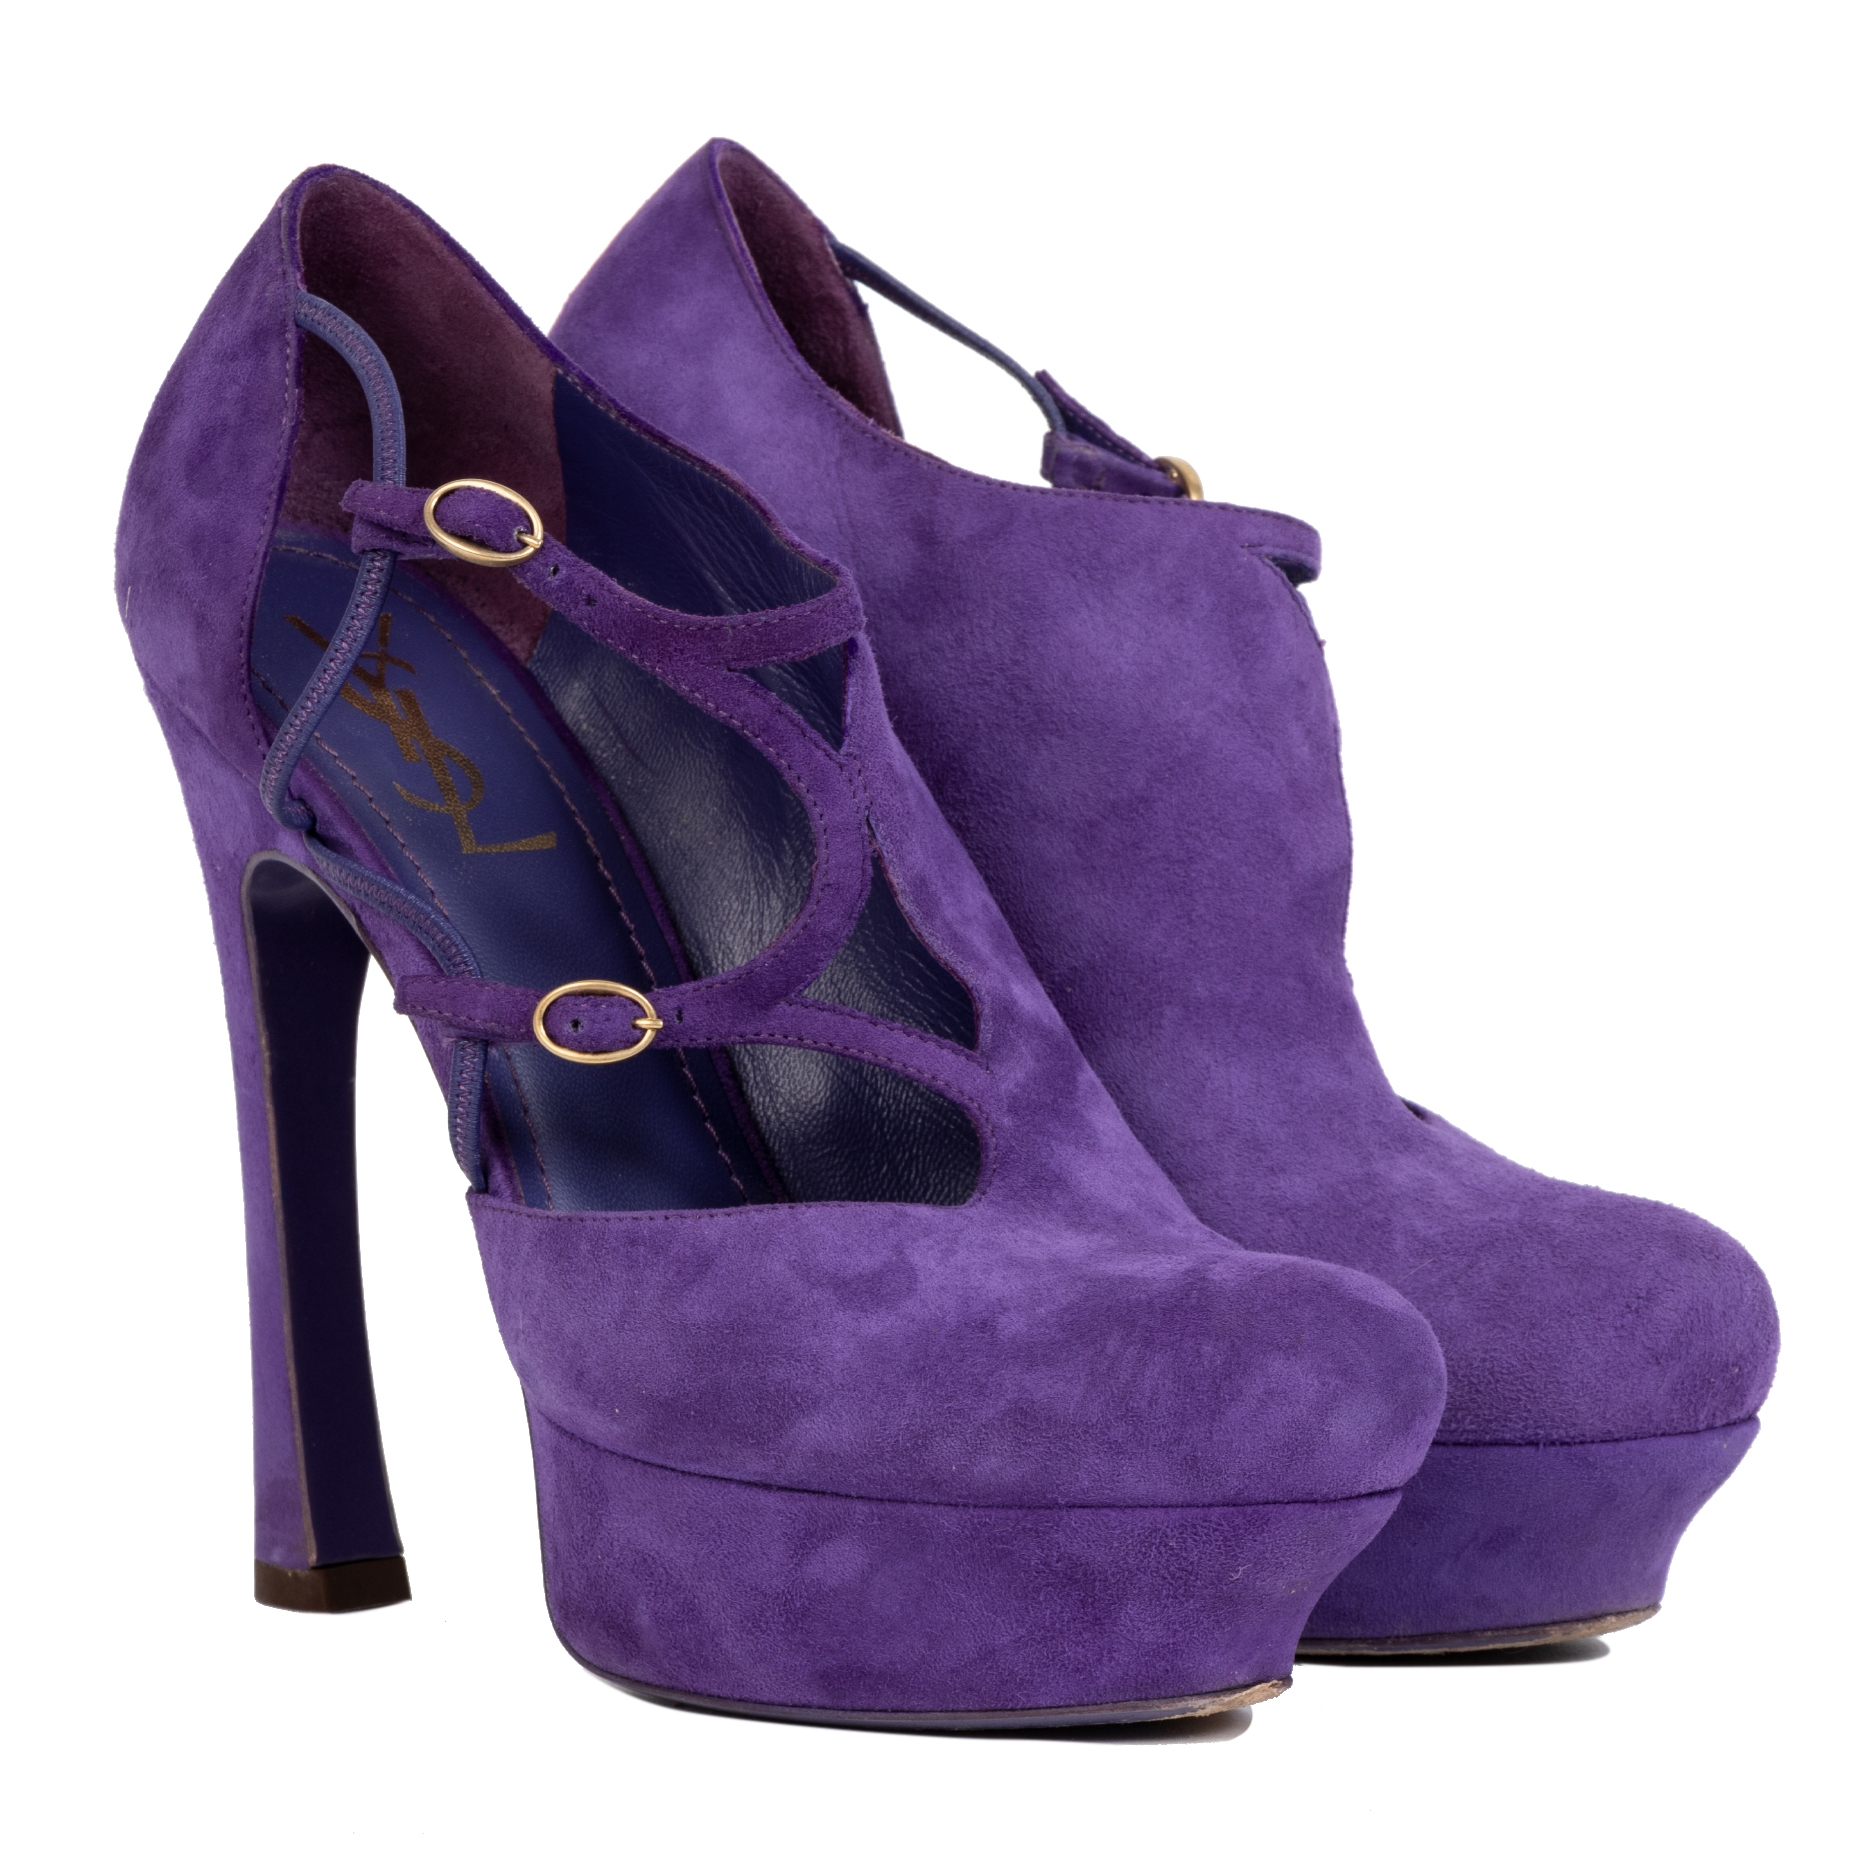 Authentic secondhand Yves Saint Laurent Purple Palais Suede Pumps - Size 39 designer bags accessories shoes pumps high heels designer brands fashion safe secure online shopping worldwide shipping